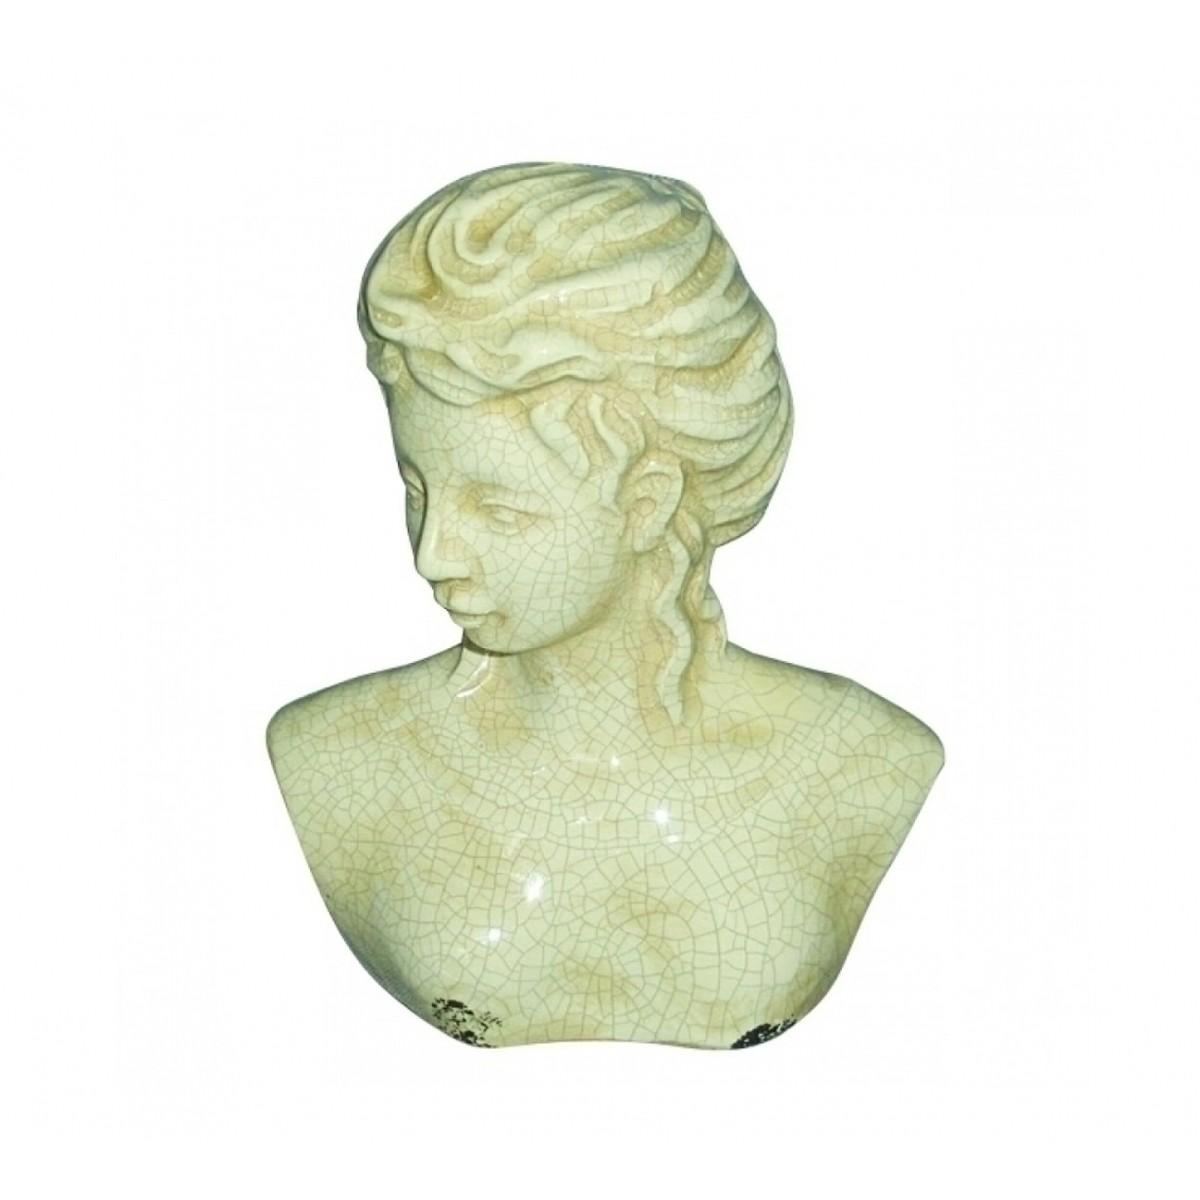 Figura Busto Decorativa em Cerâmica  - N Store